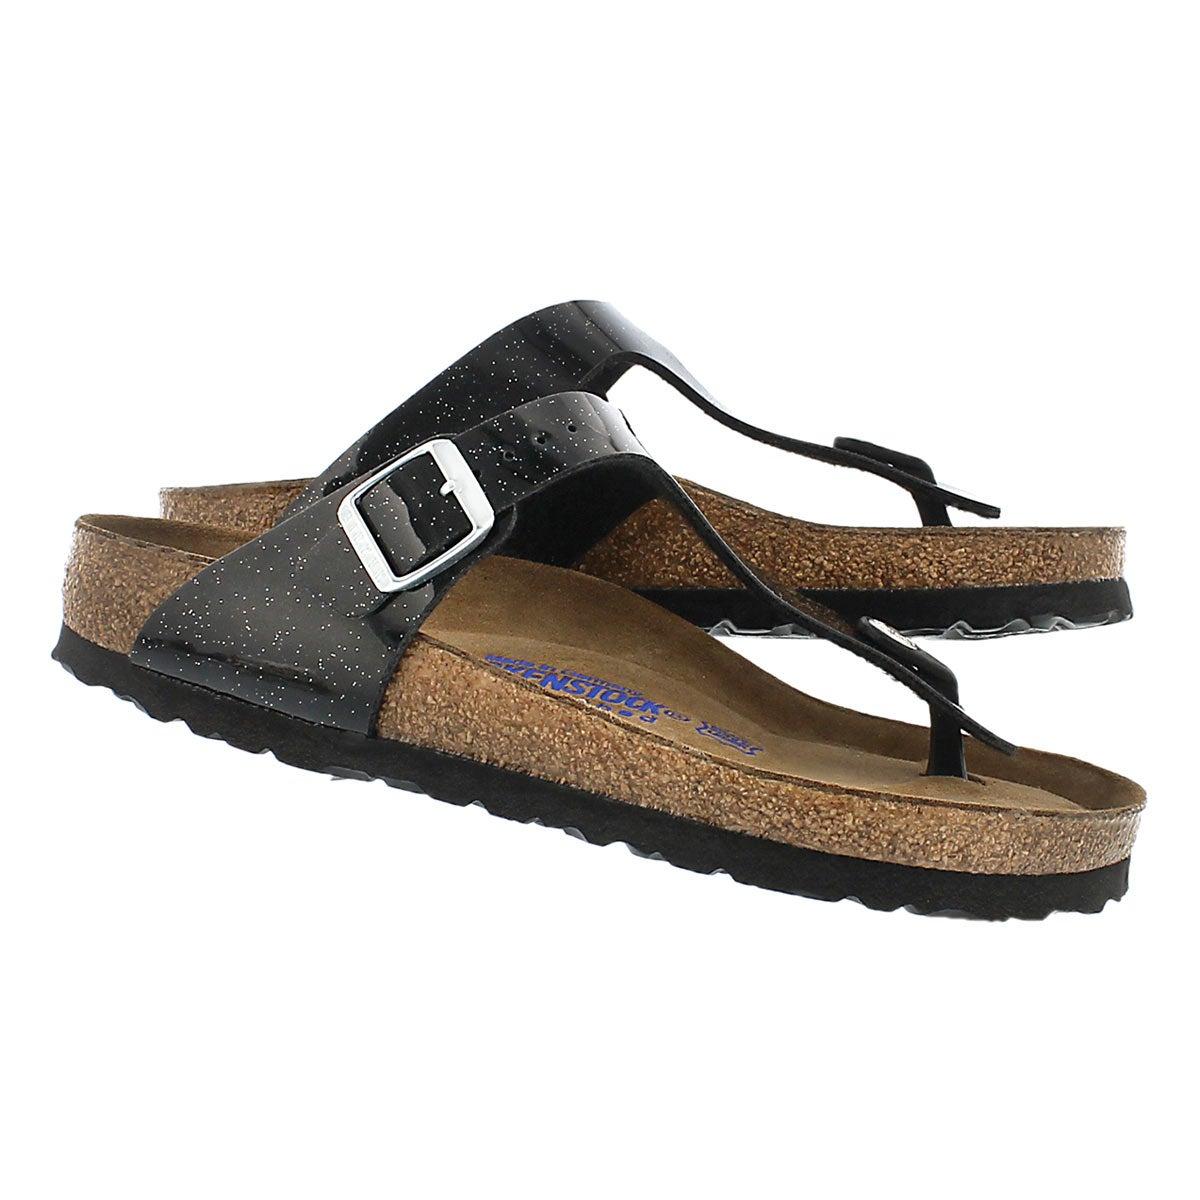 Lds Gizeh SF magic galaxy blk sandal